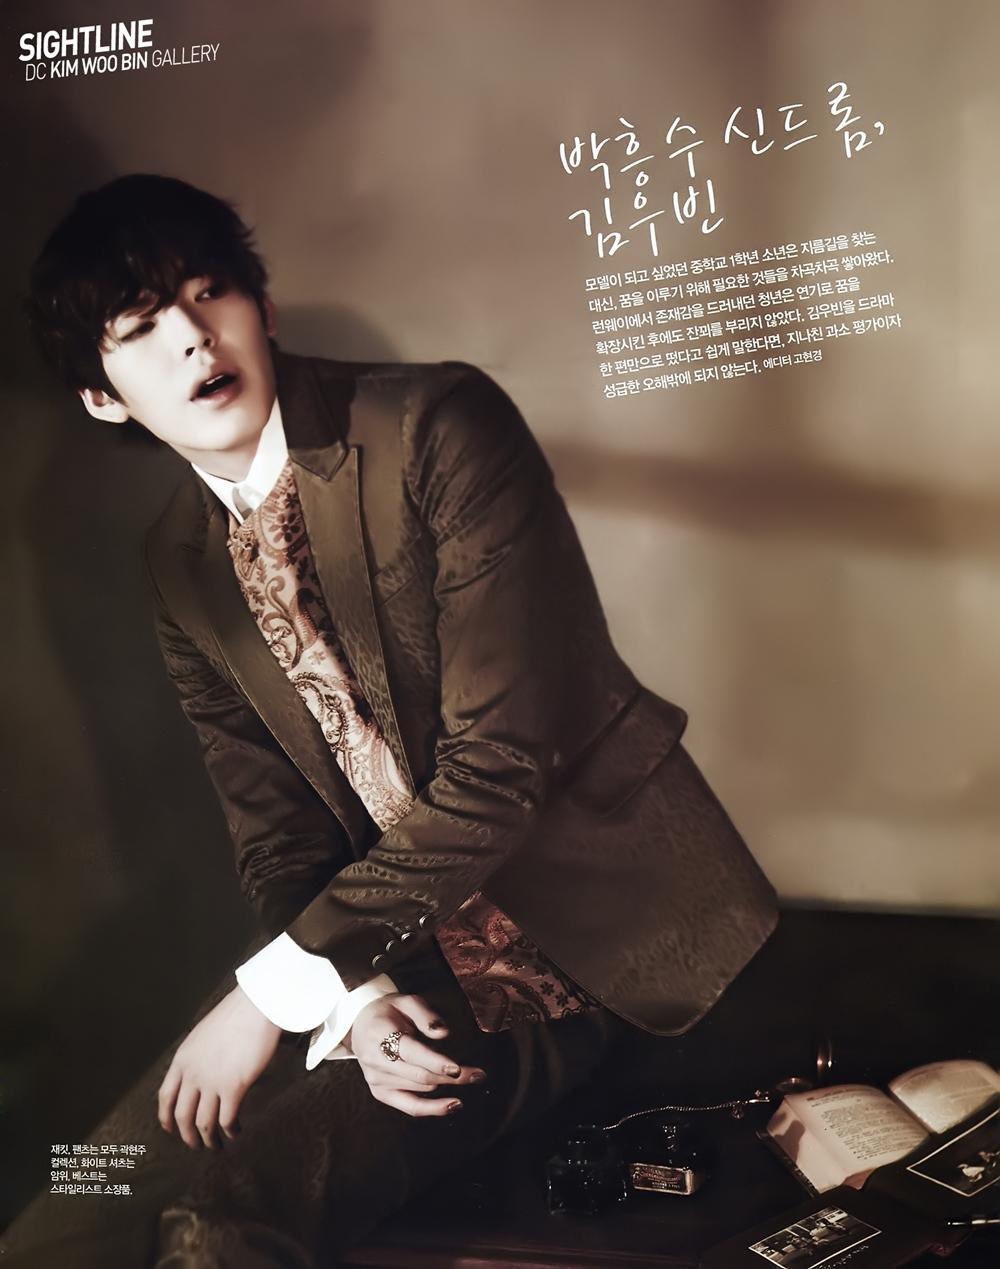 singles kim woo bin 3